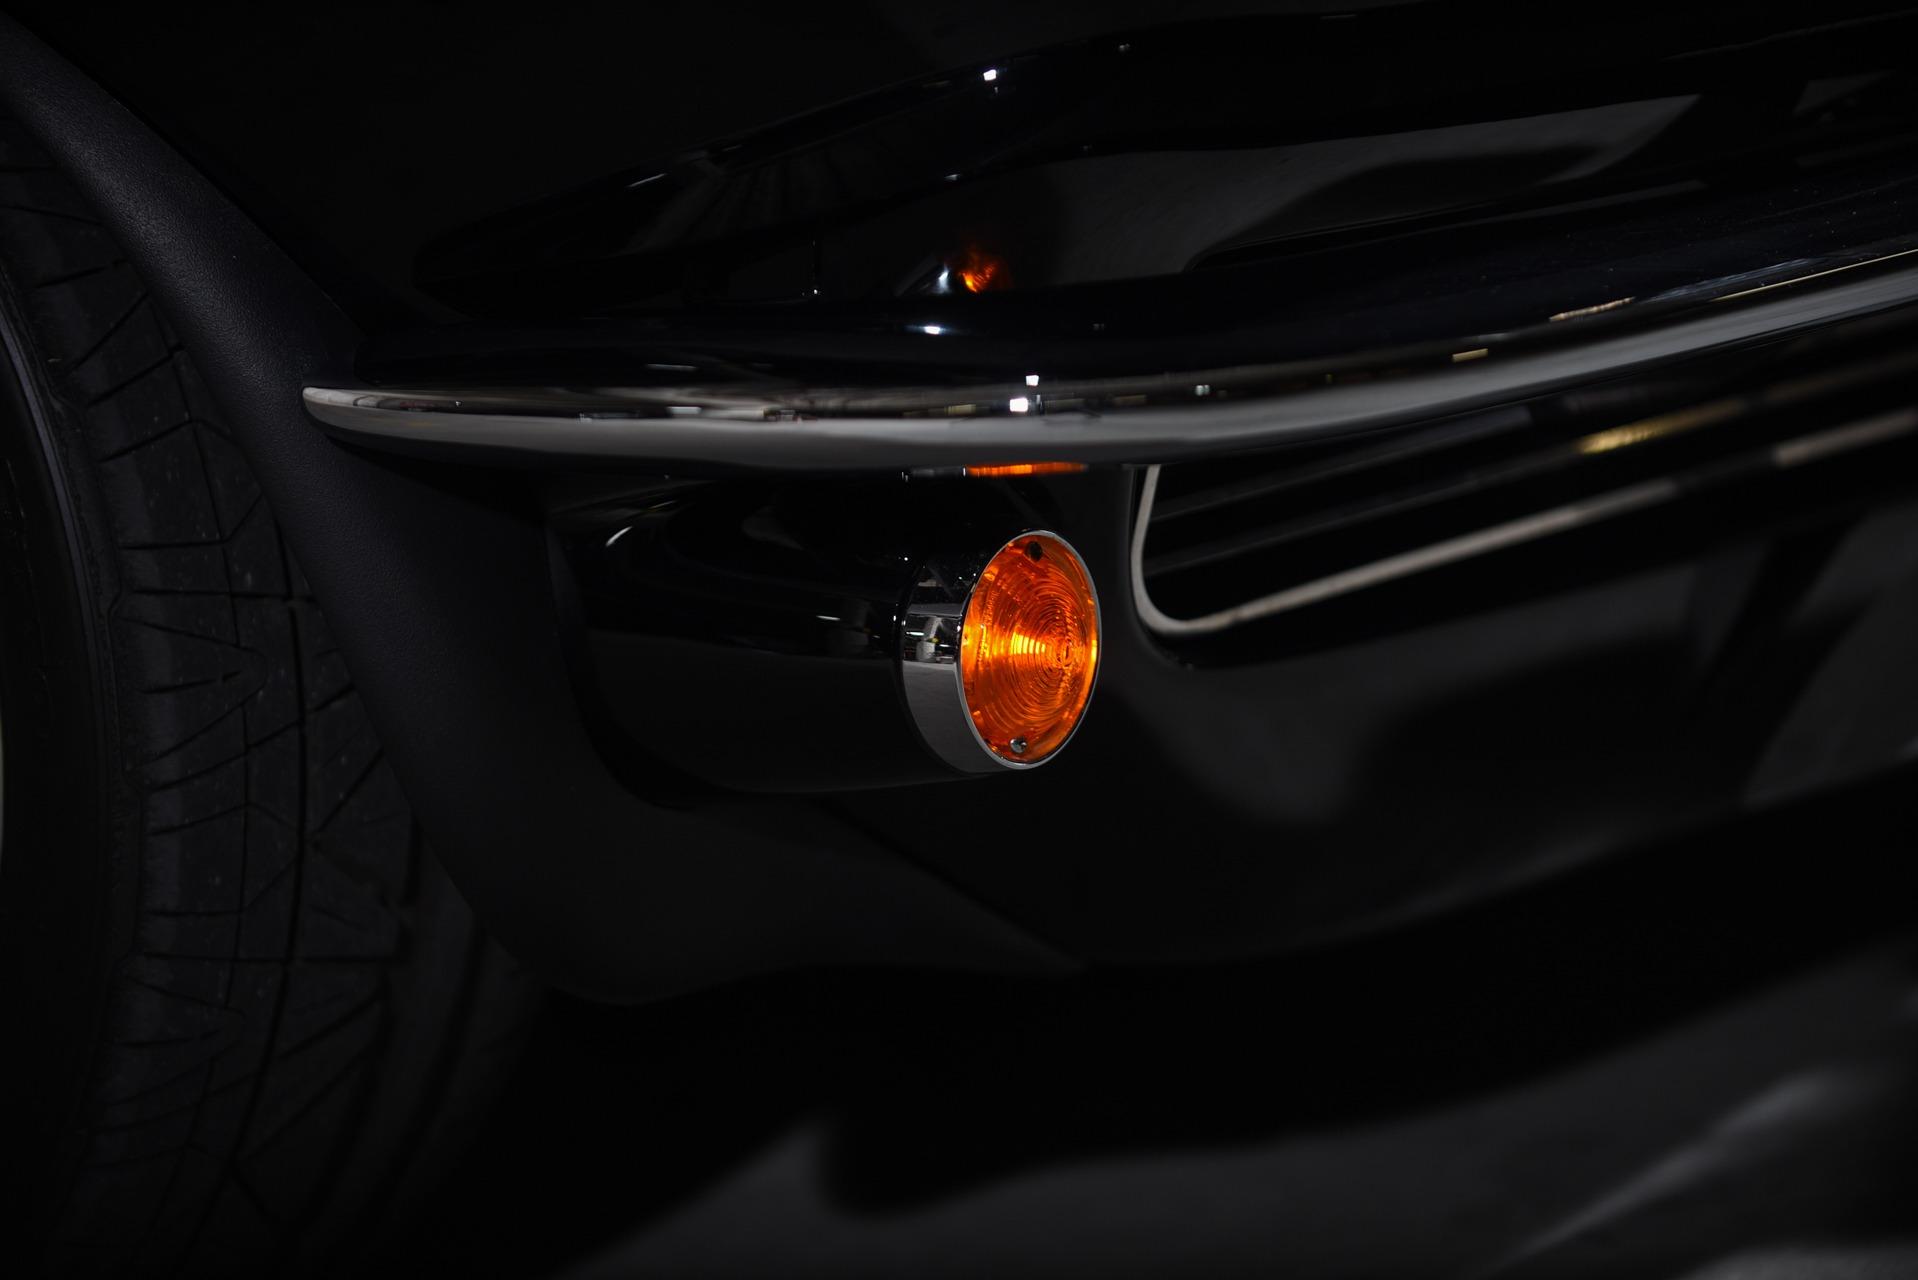 Used 2013 Chevrolet Corvette Karl Kustom Split Window | Valley Stream, NY